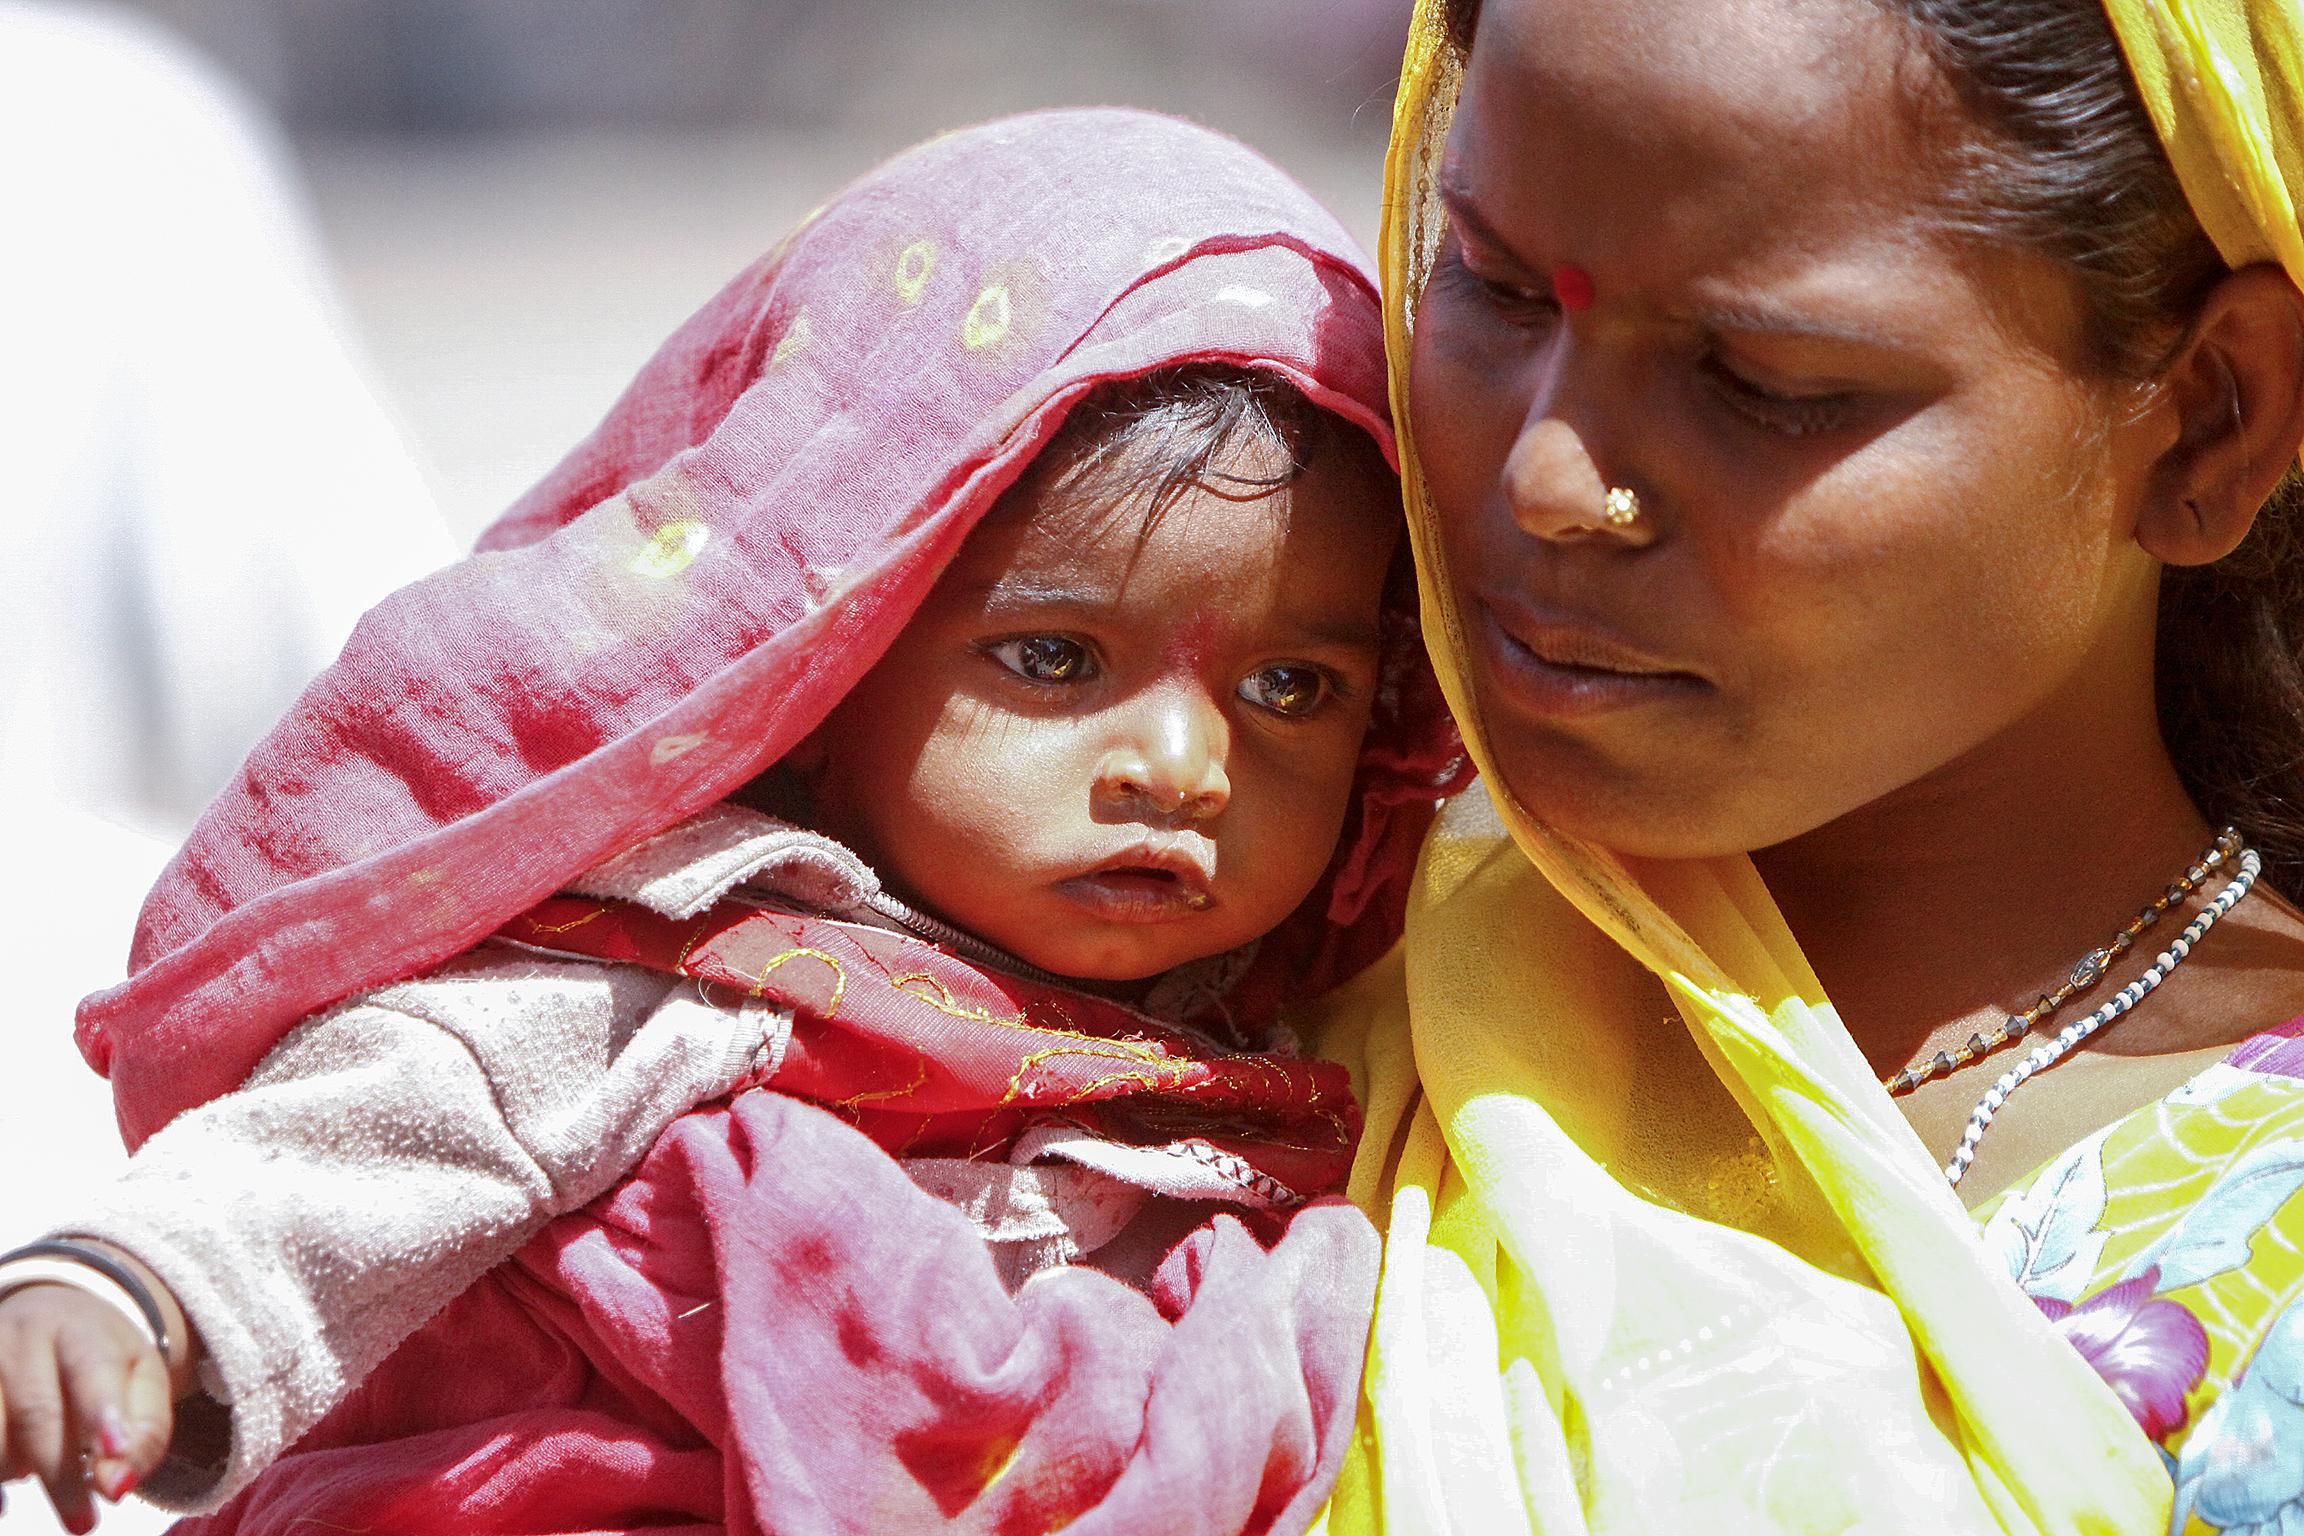 portraits-indien-inde-rajasthan-2010-marie-colette-becker-16